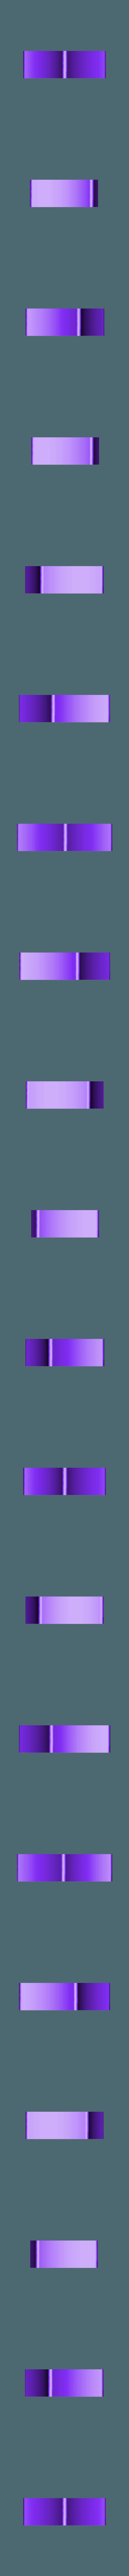 DiamondSOLID.stl Download free STL file Cards Cookie Cutters (4 Pack) • 3D print design, Jdog